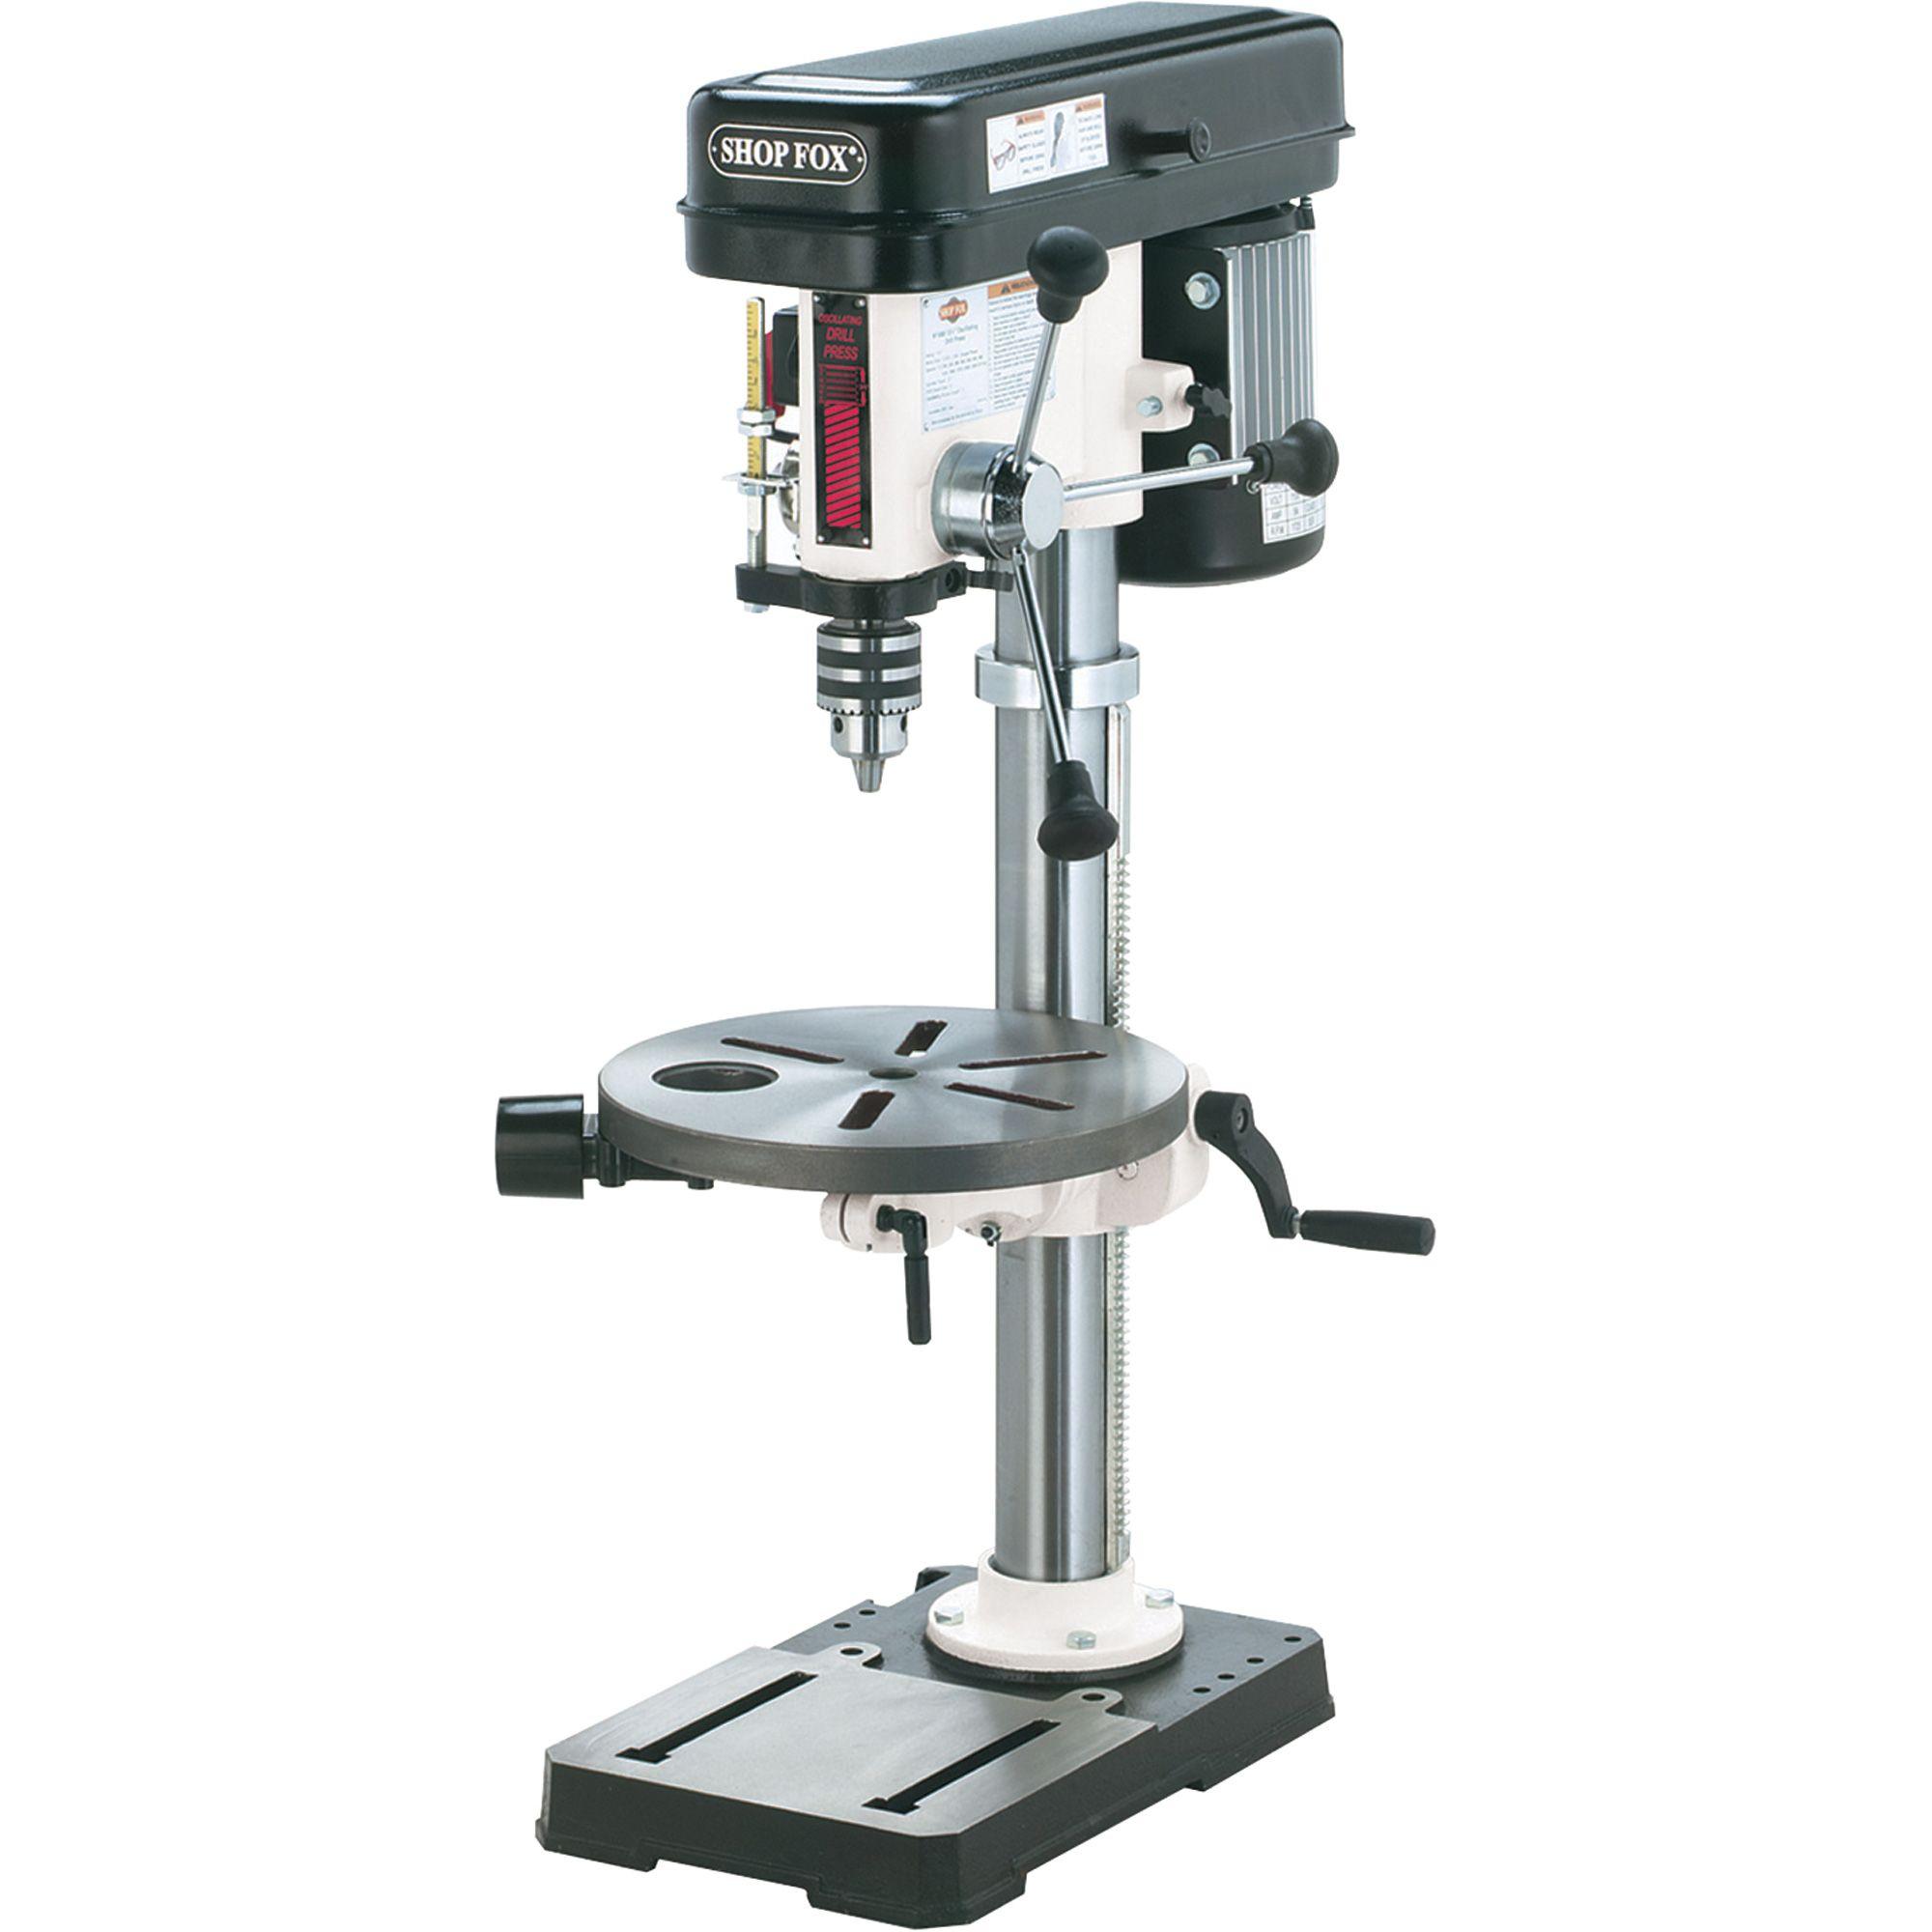 Shop Fox Oscillating Benchtop Drill Press 13in 3 4 Hp 120v Model W1668 In 2020 Drill Press Drill Presses Drill